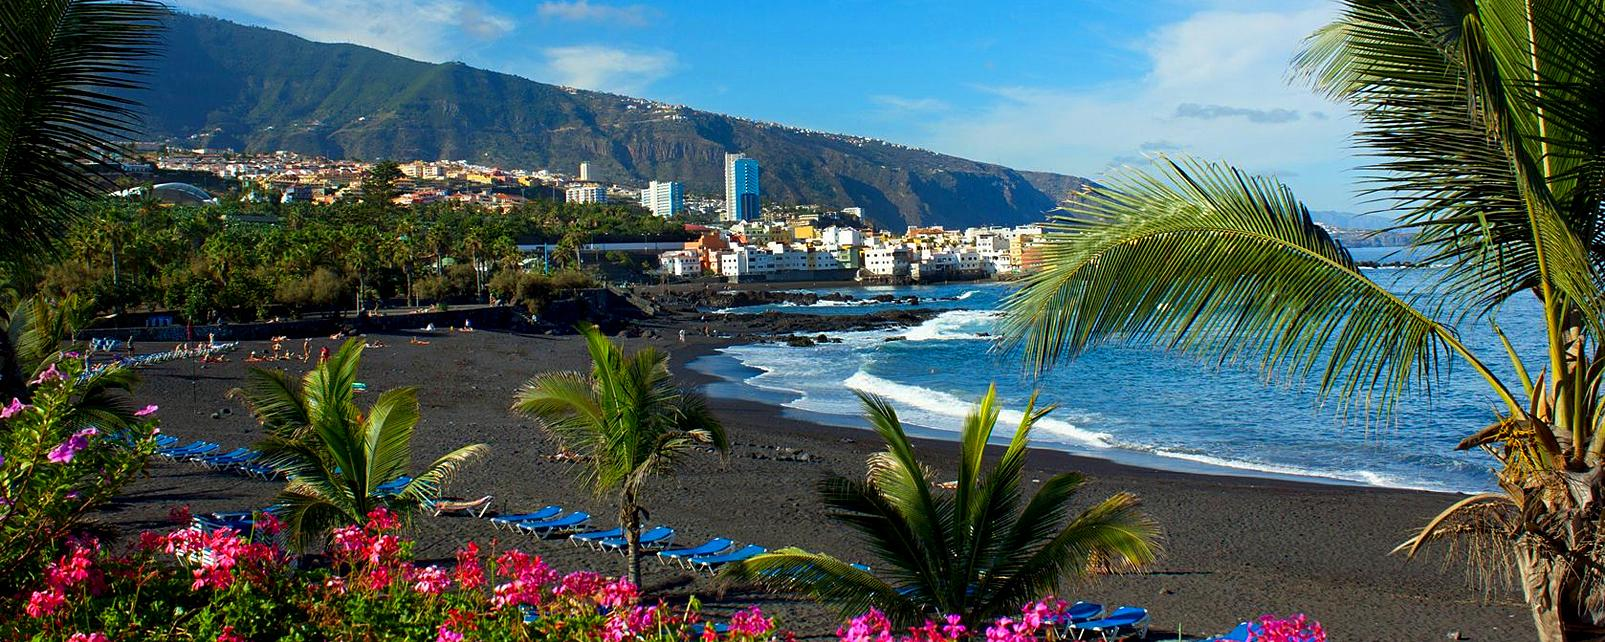 Vol Hotel Tenerife